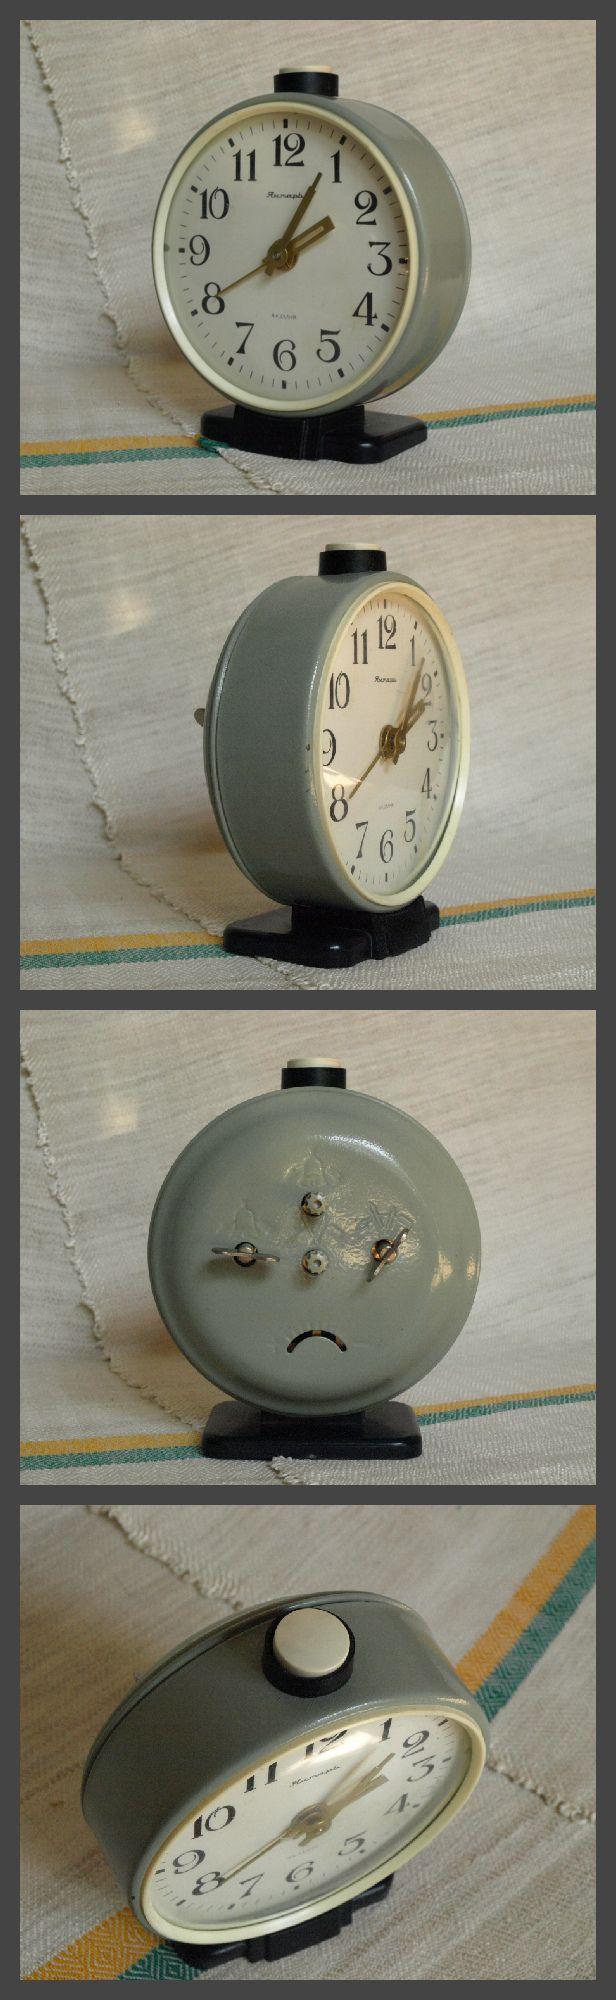 Big industrial style alarm clock